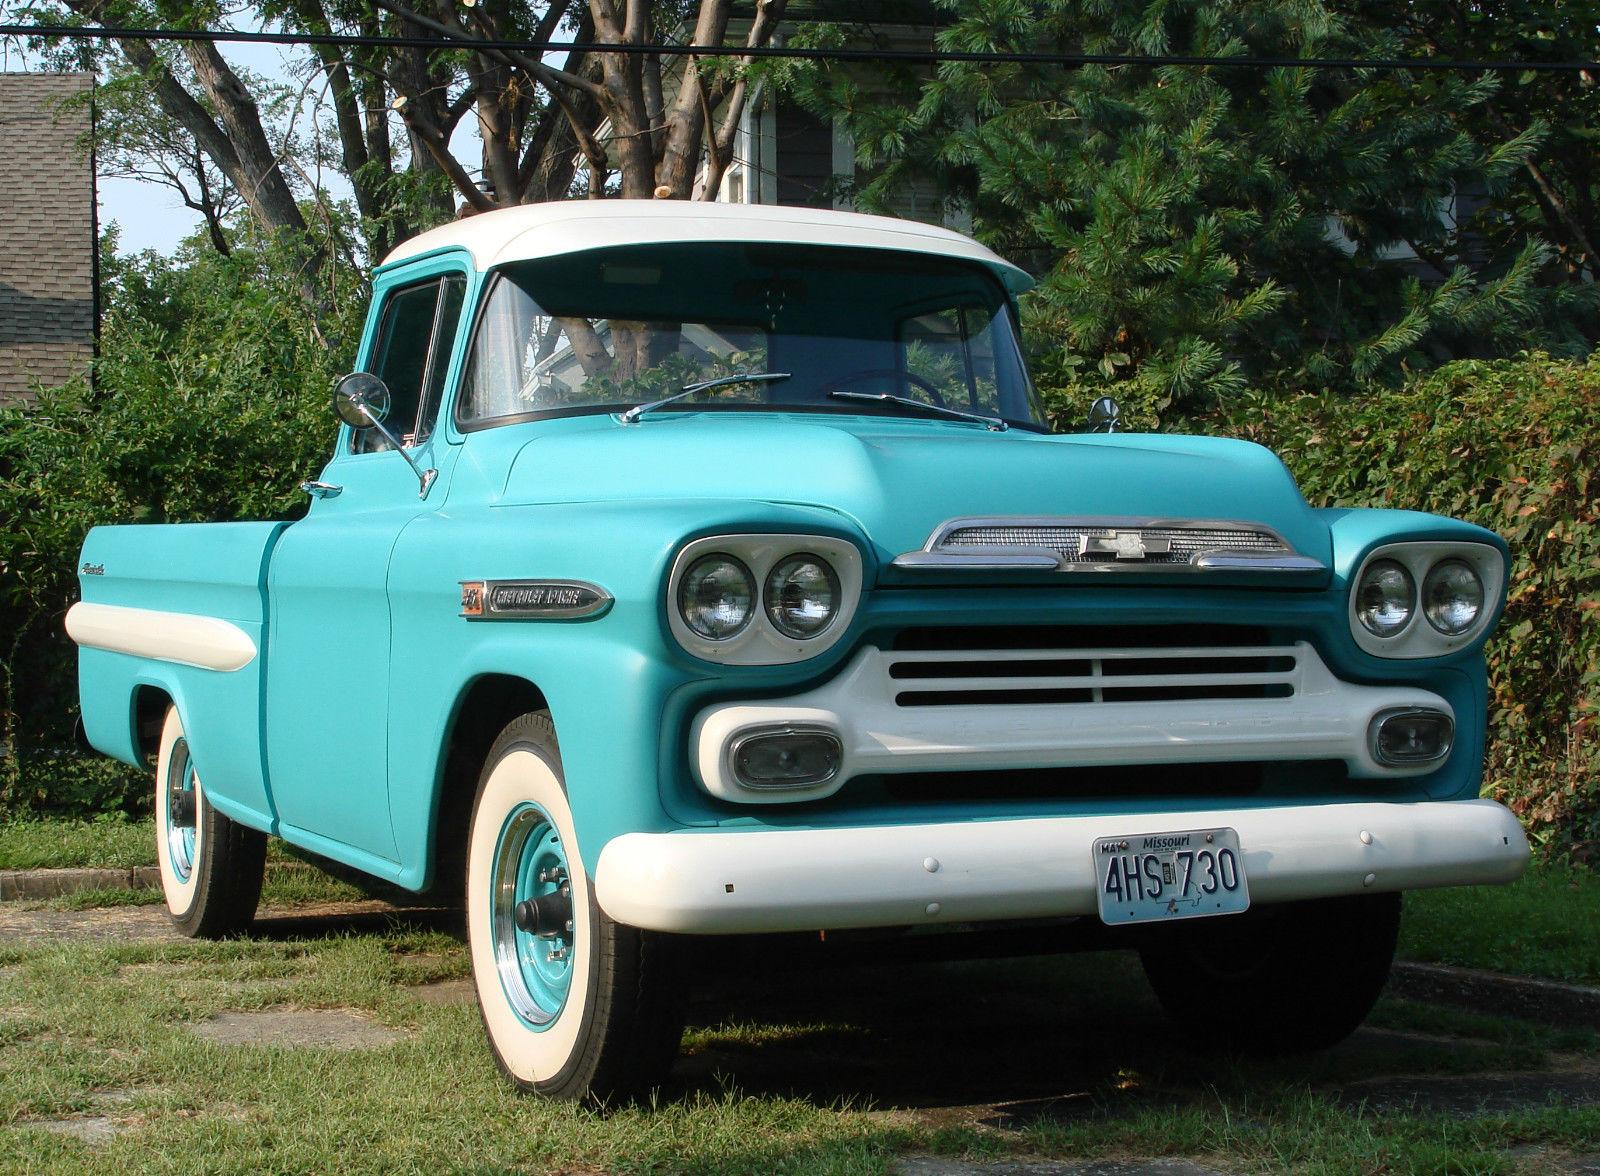 All American Classic Cars: 1959 Chevrolet Apache Fleetside Pickup Truck